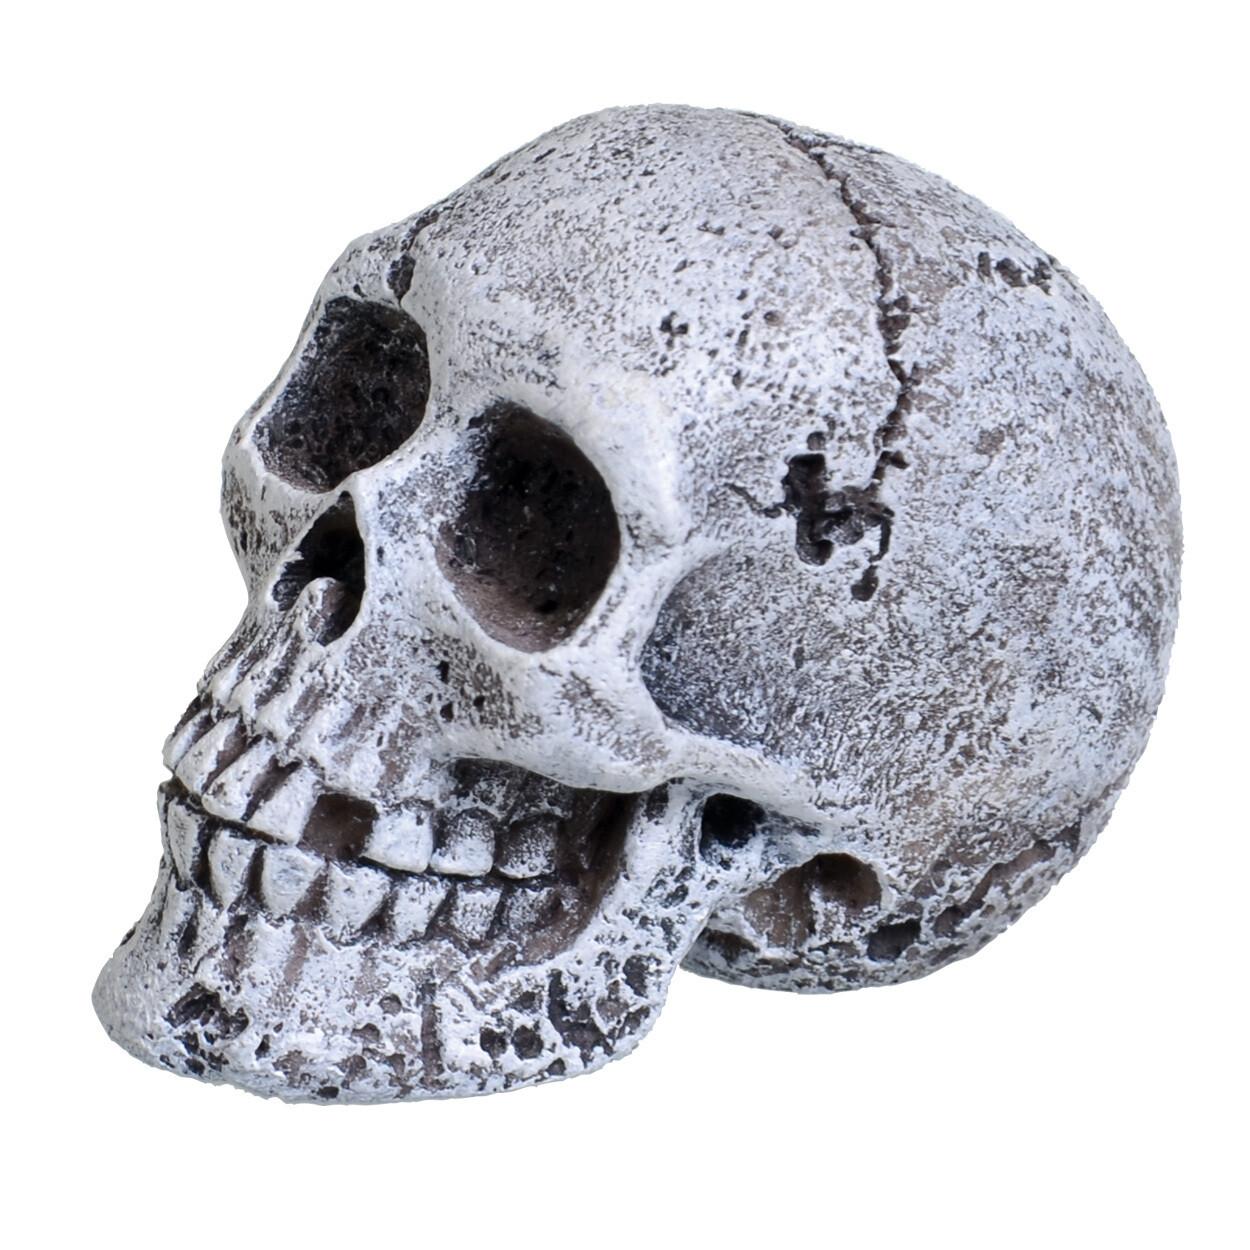 Underwater Treasures Mini Skull